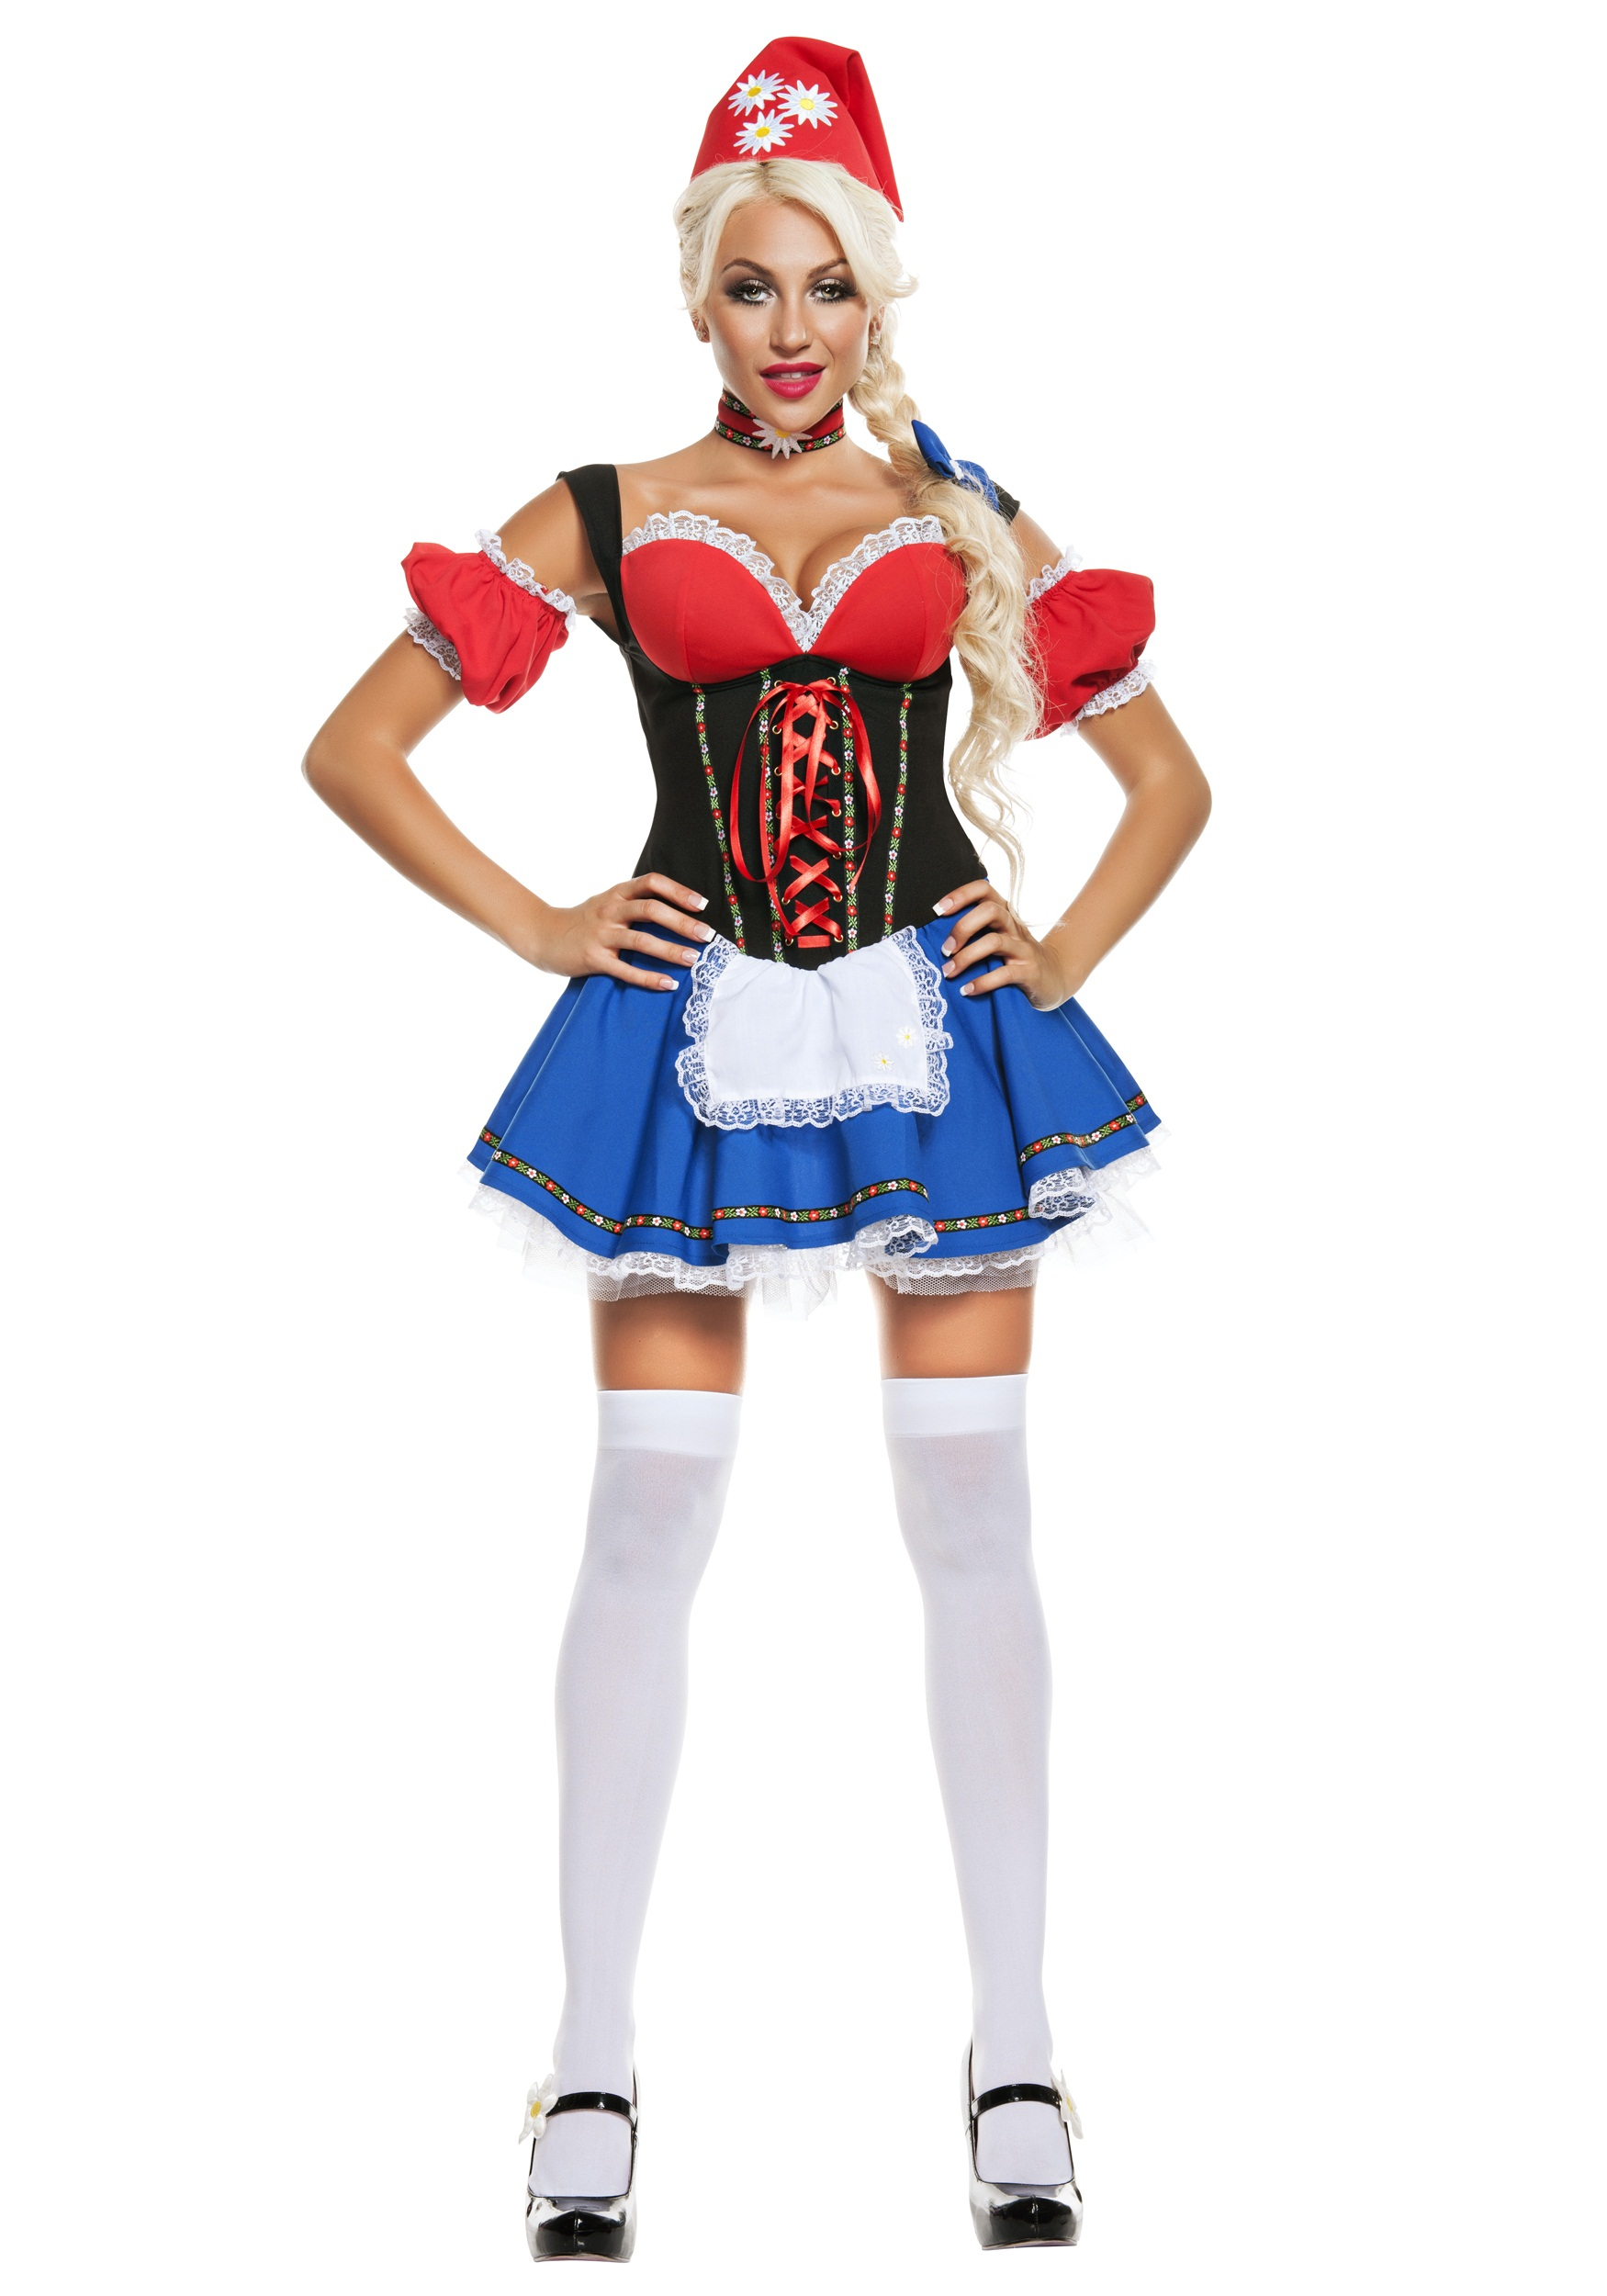 Womenu0027s Daisy Meadow Gnome Costume  sc 1 st  Halloween Costumes & Womenu0027s Daisy Meadow Gnome Costume - Halloween Costumes